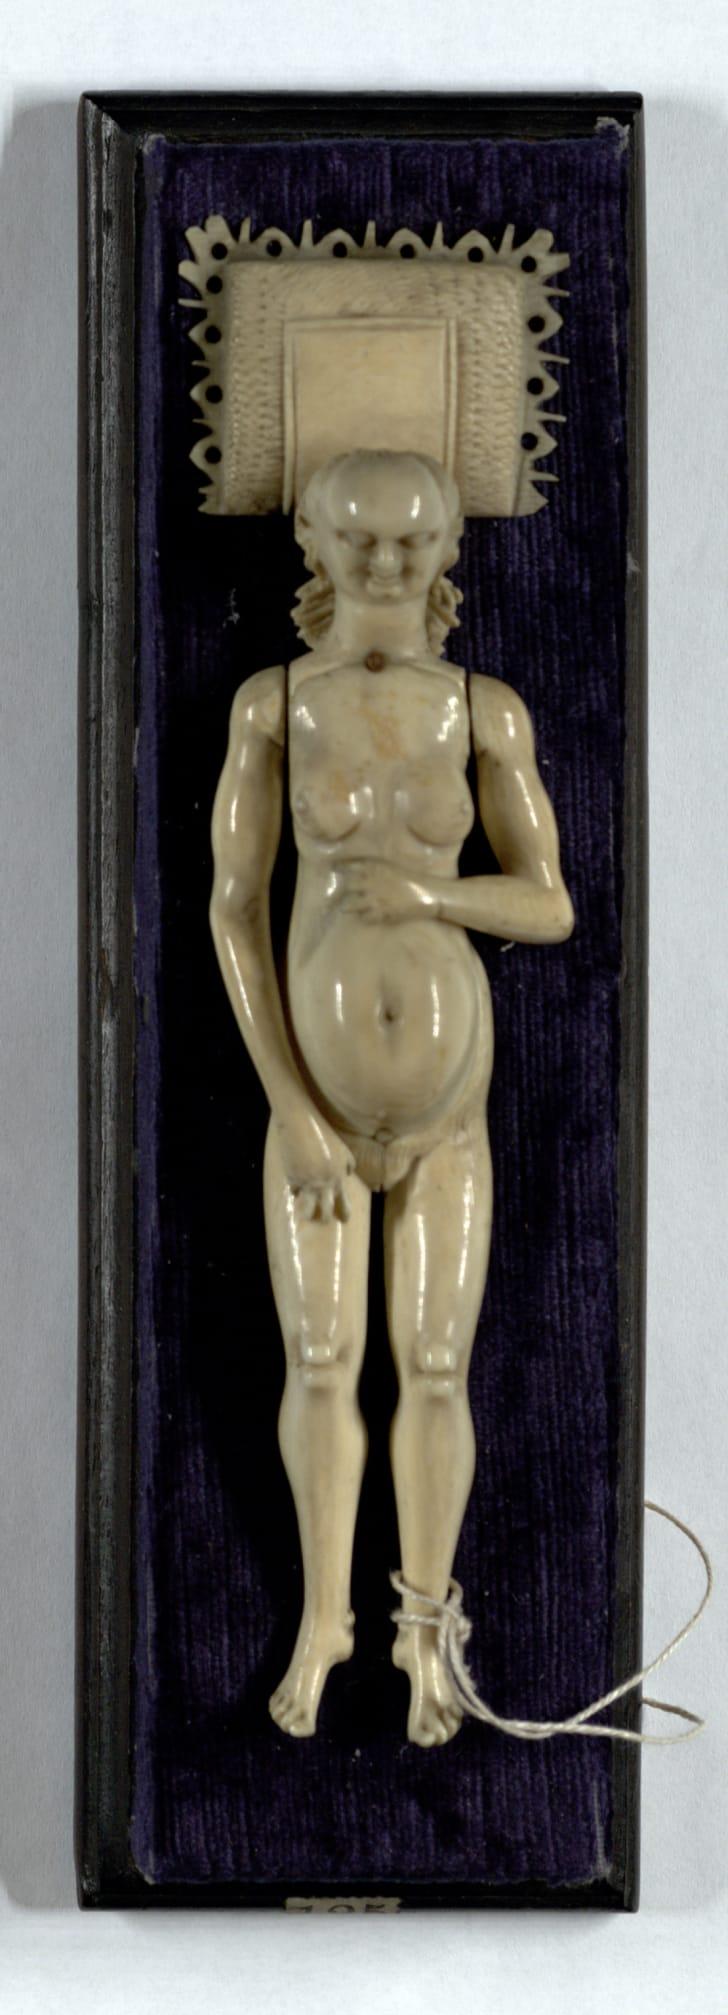 17th Century Ivory Manikin